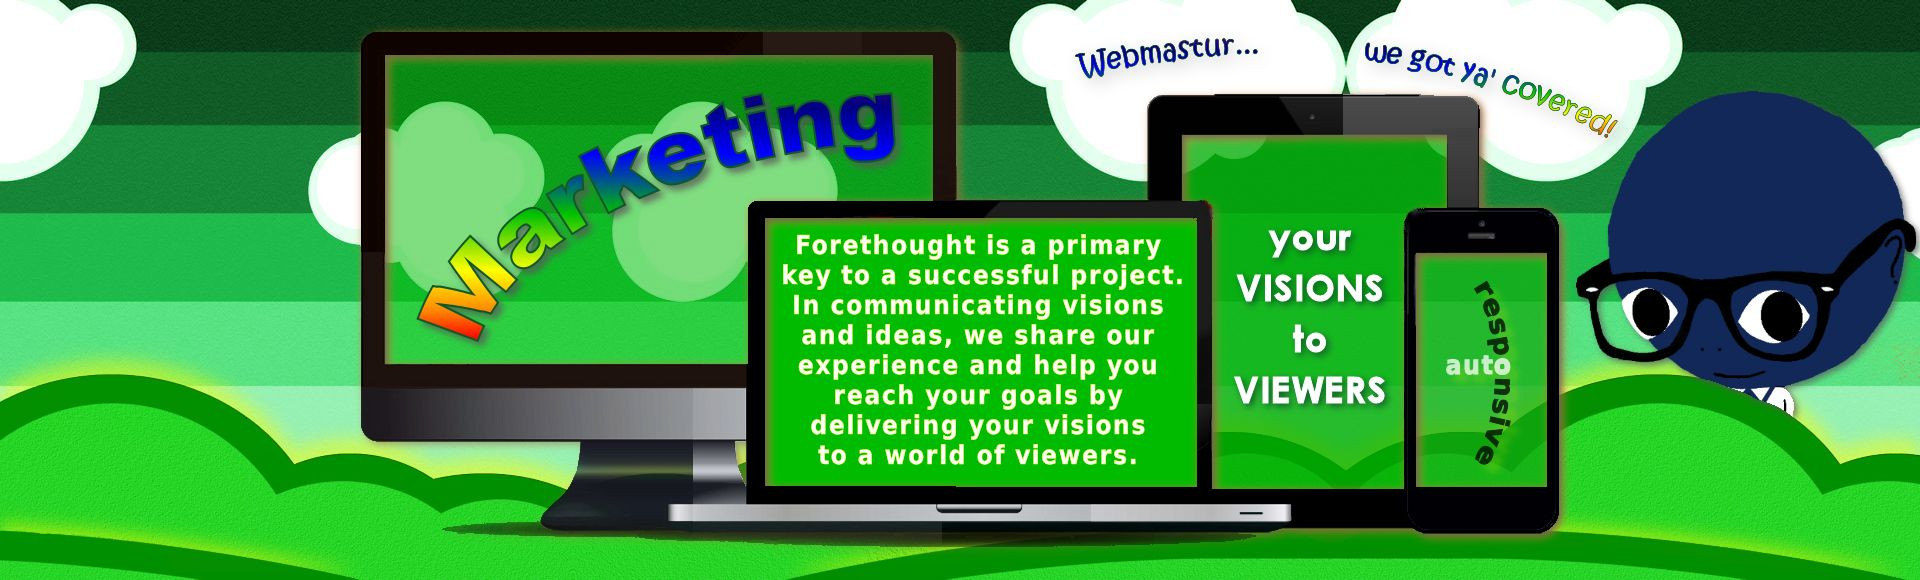 webmastur slides 3 marketing